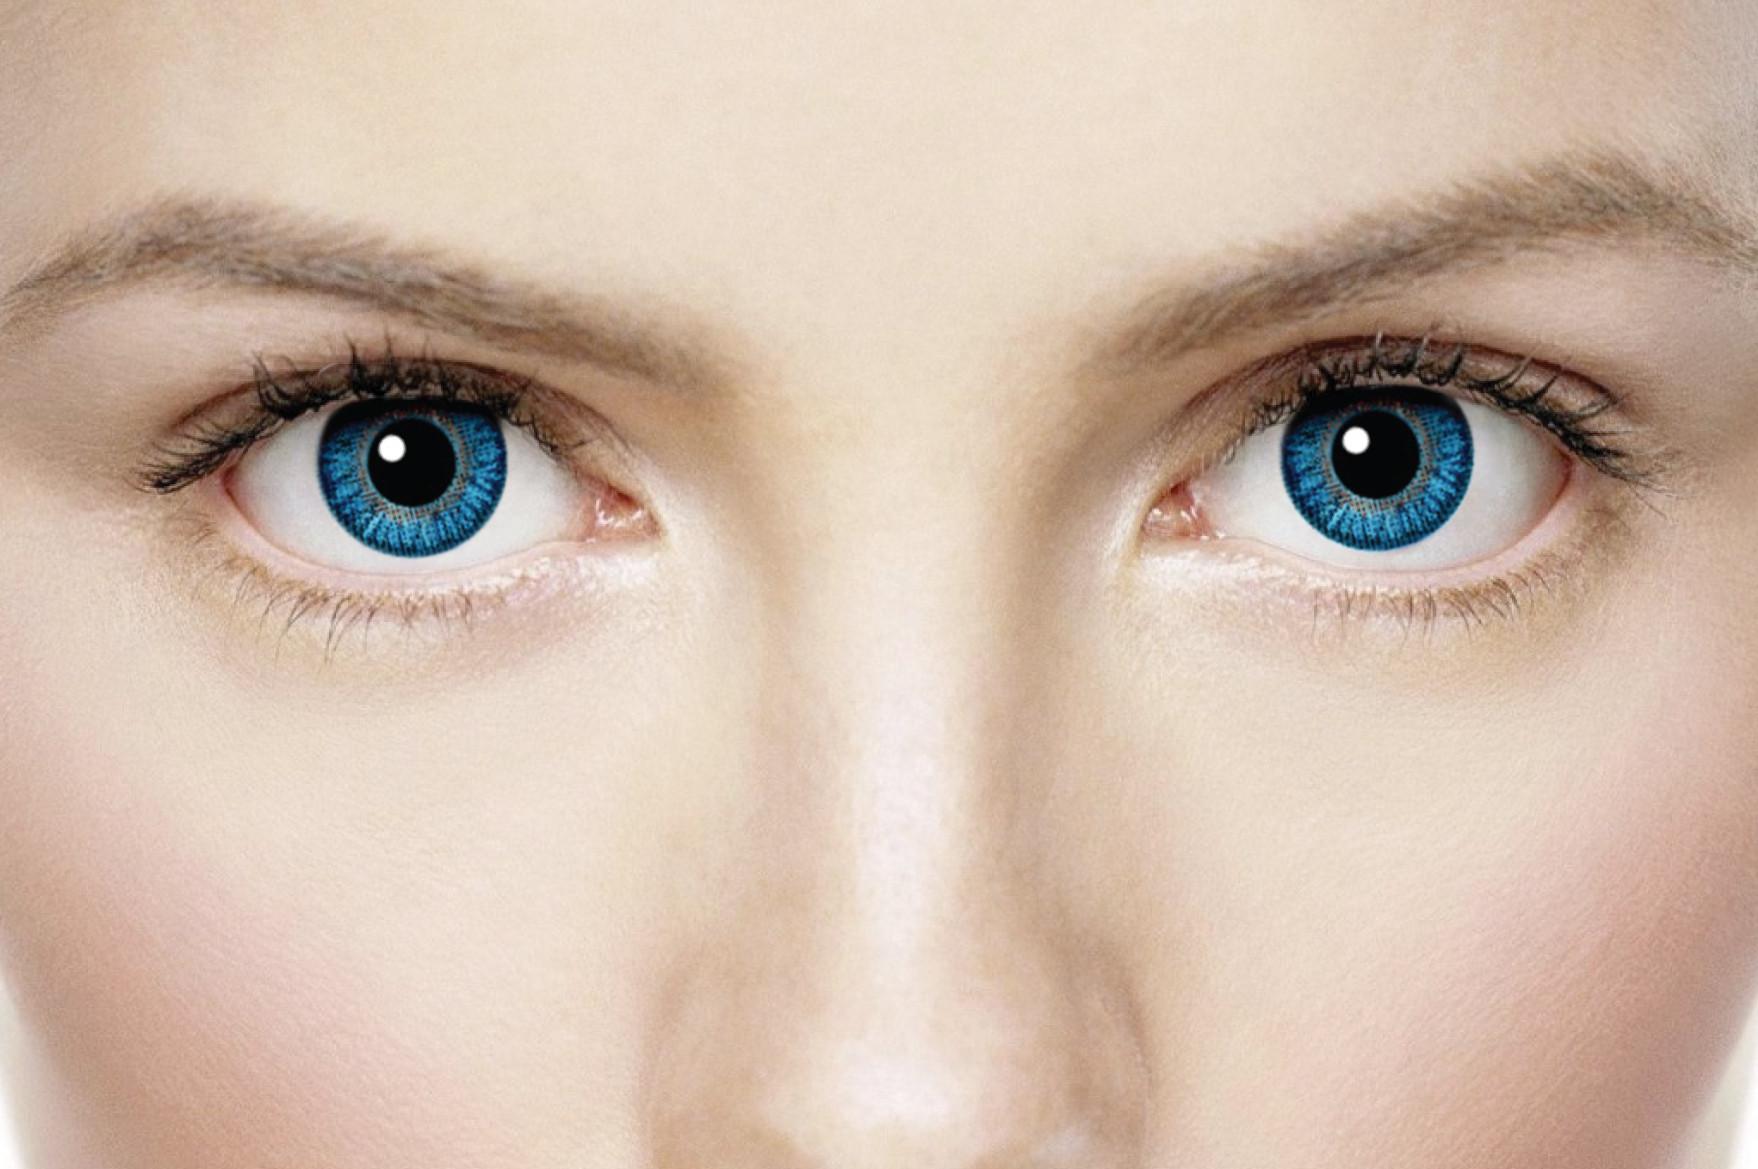 картинки глаз не соединяются плацентация плацента прикреплена